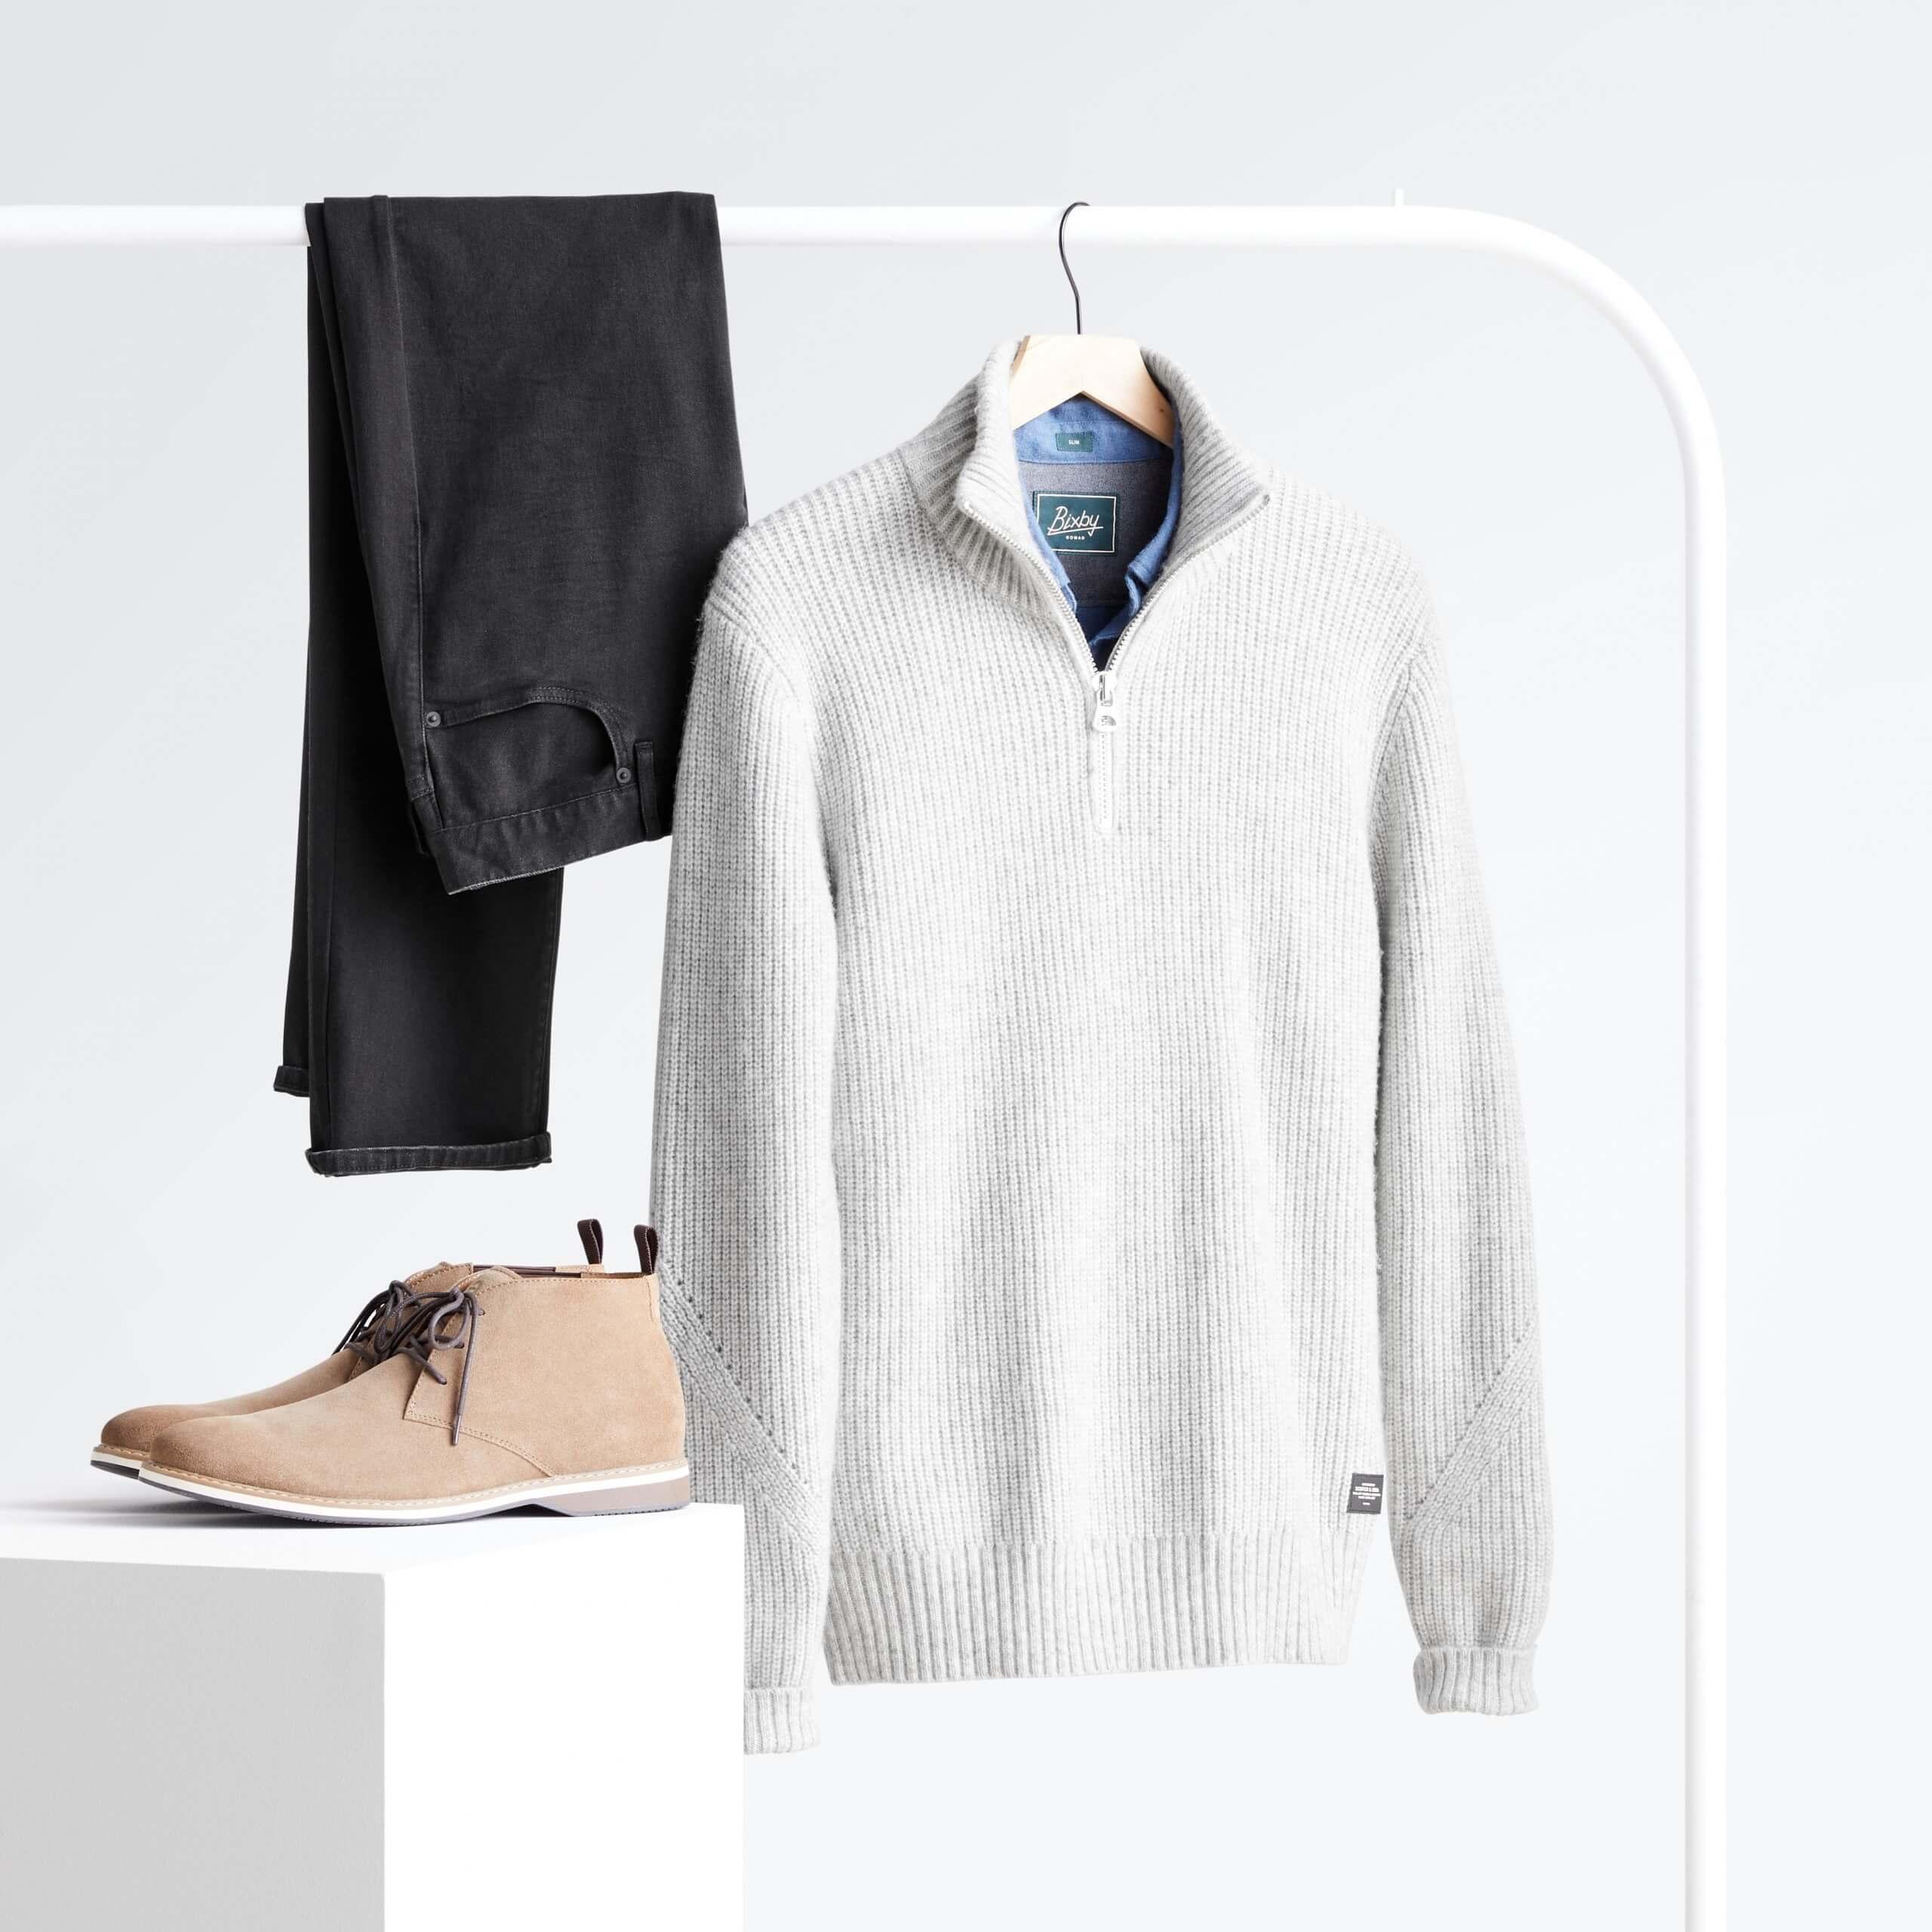 Stitch Fix Men's light grey quarter zip sweater over blue button-down, black jeans hanging on white rack next to beige chukkas on white podium.